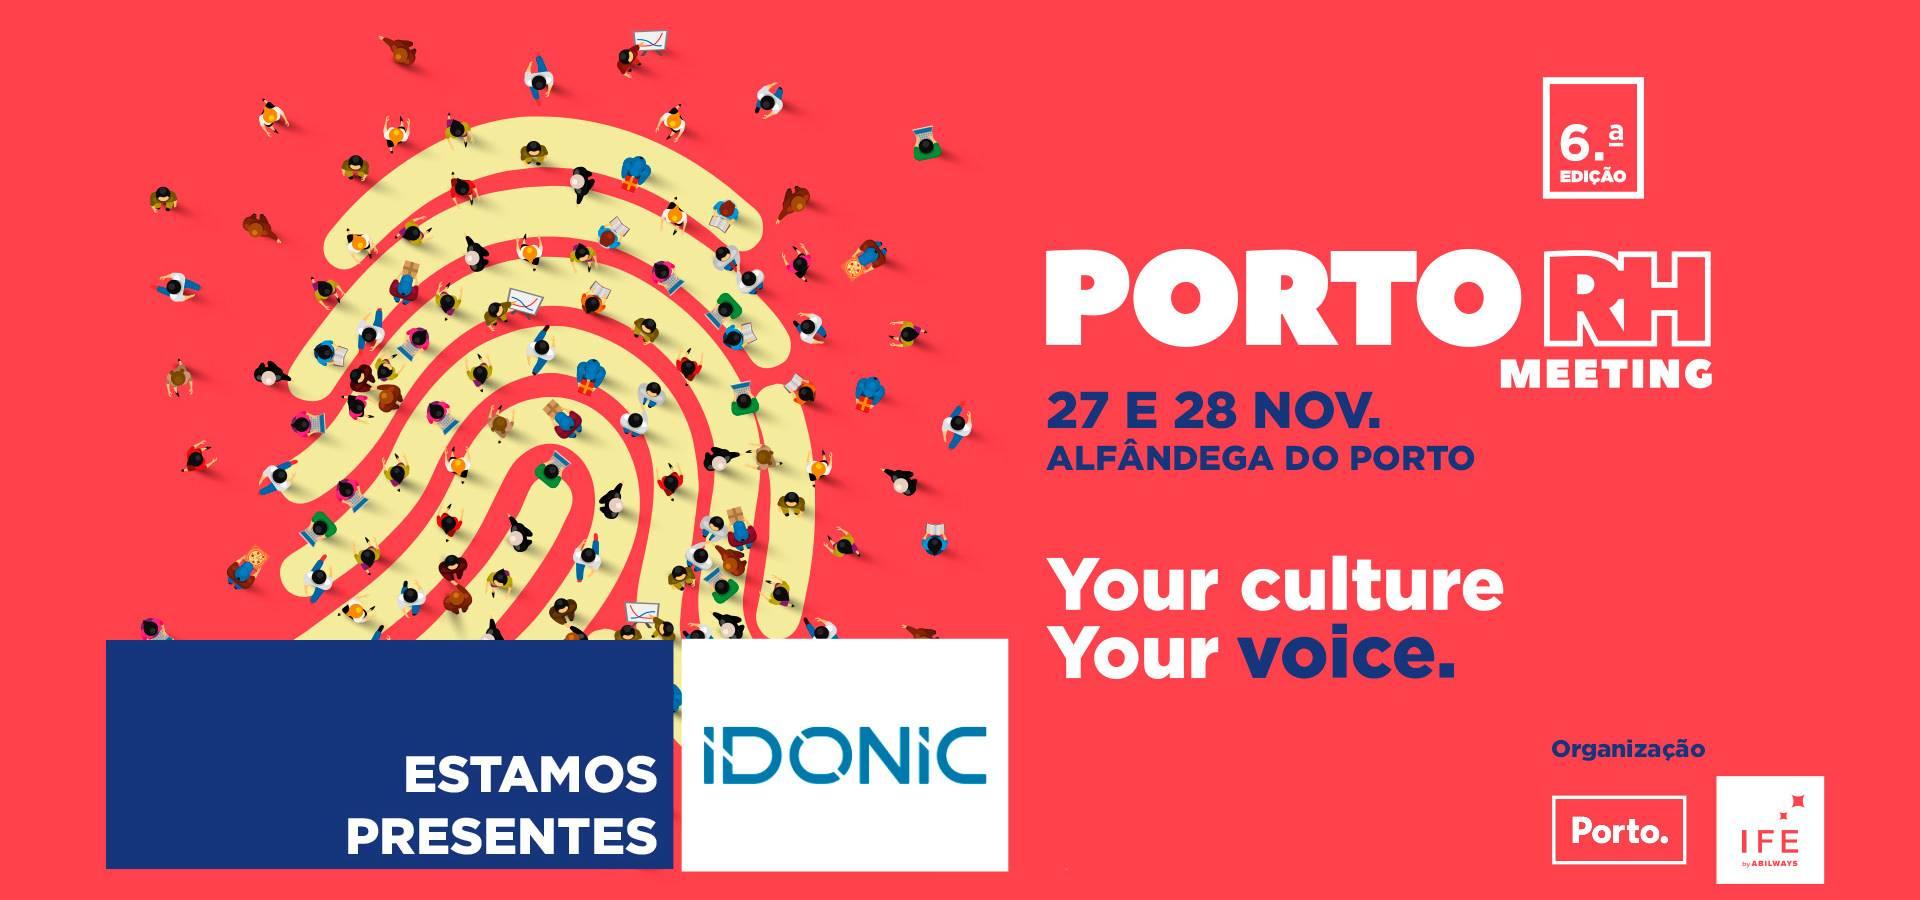 porto-rh-2019-idonic